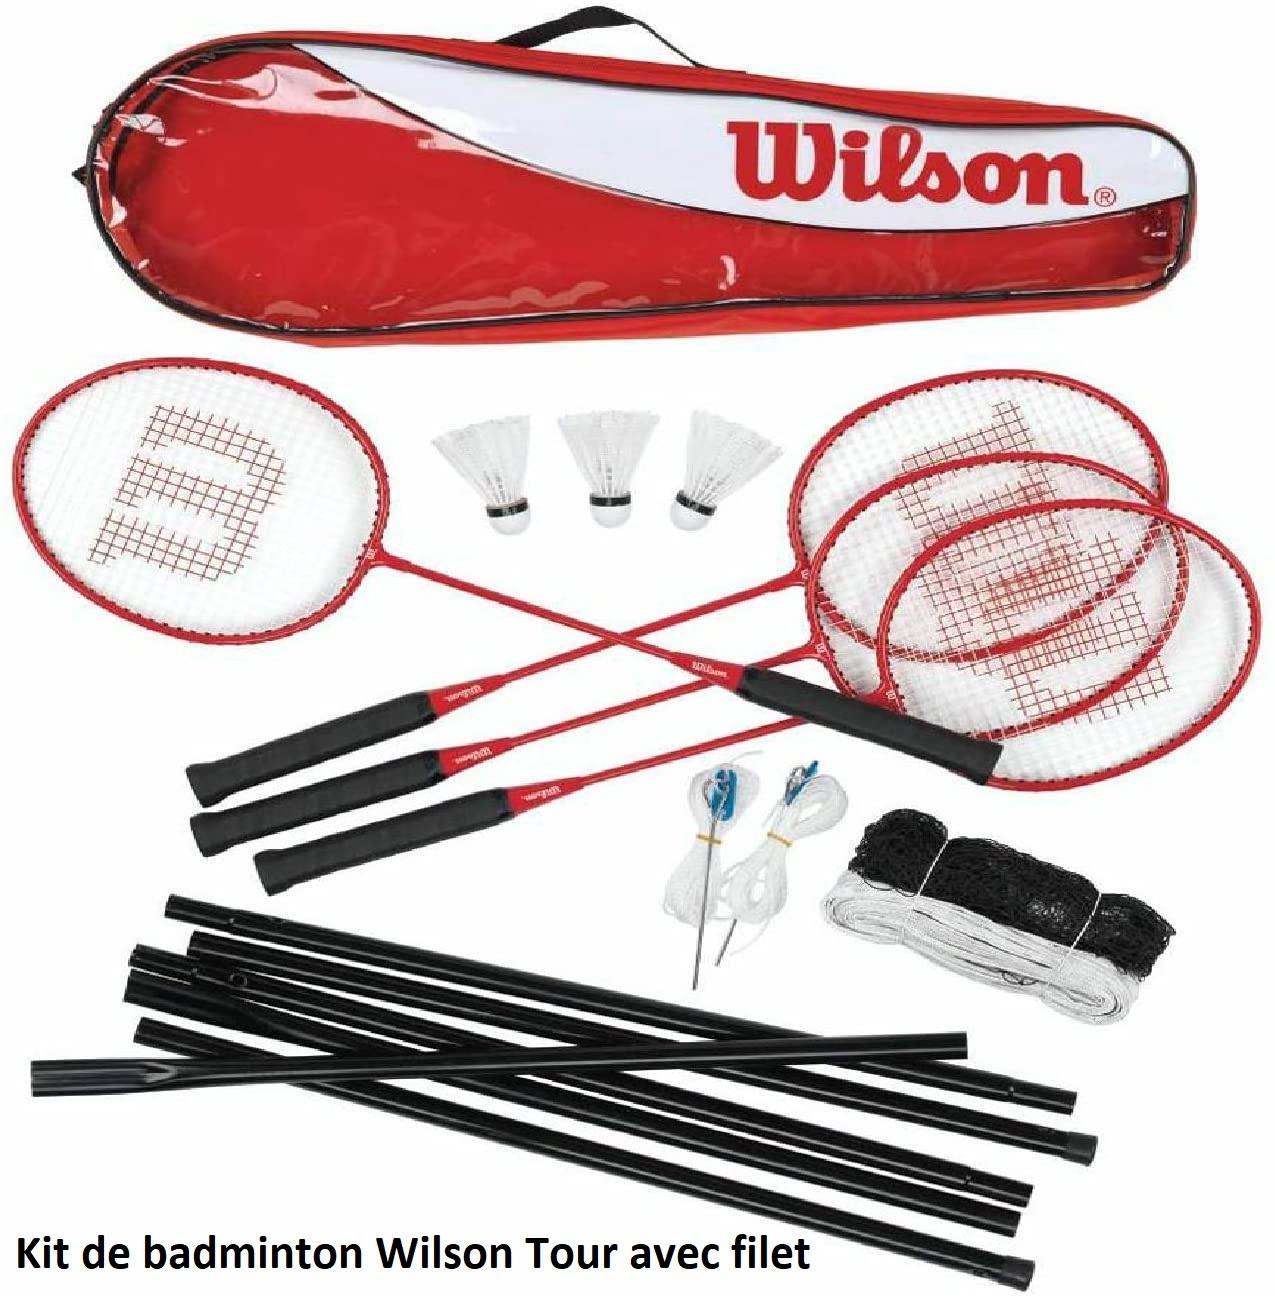 Kit de badminton Wilson avec filet